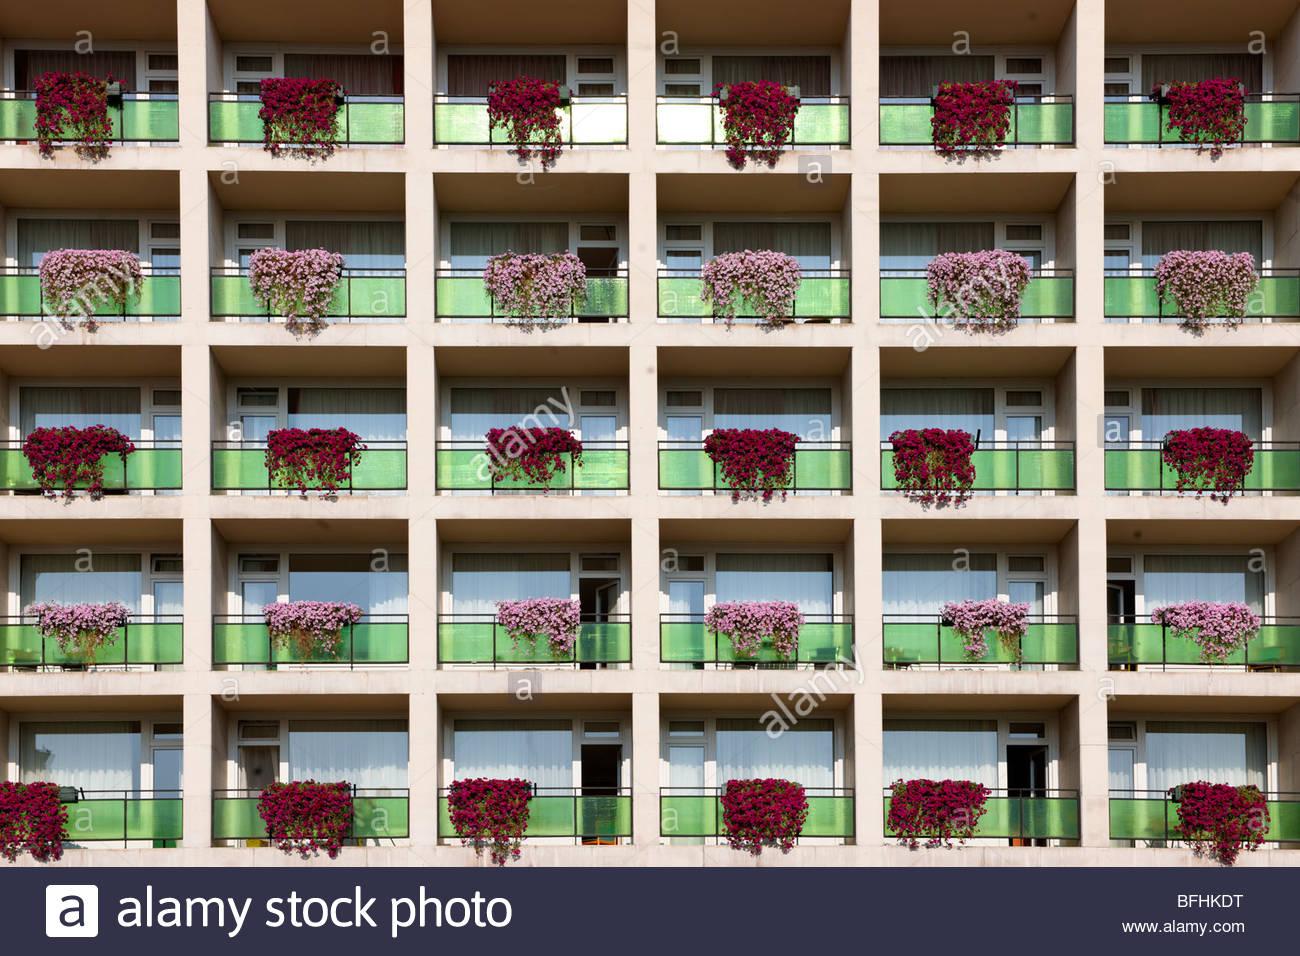 L'Hotel Aranyhomok ( architettura Socialista) , Kecskem t , Ungheria Immagini Stock